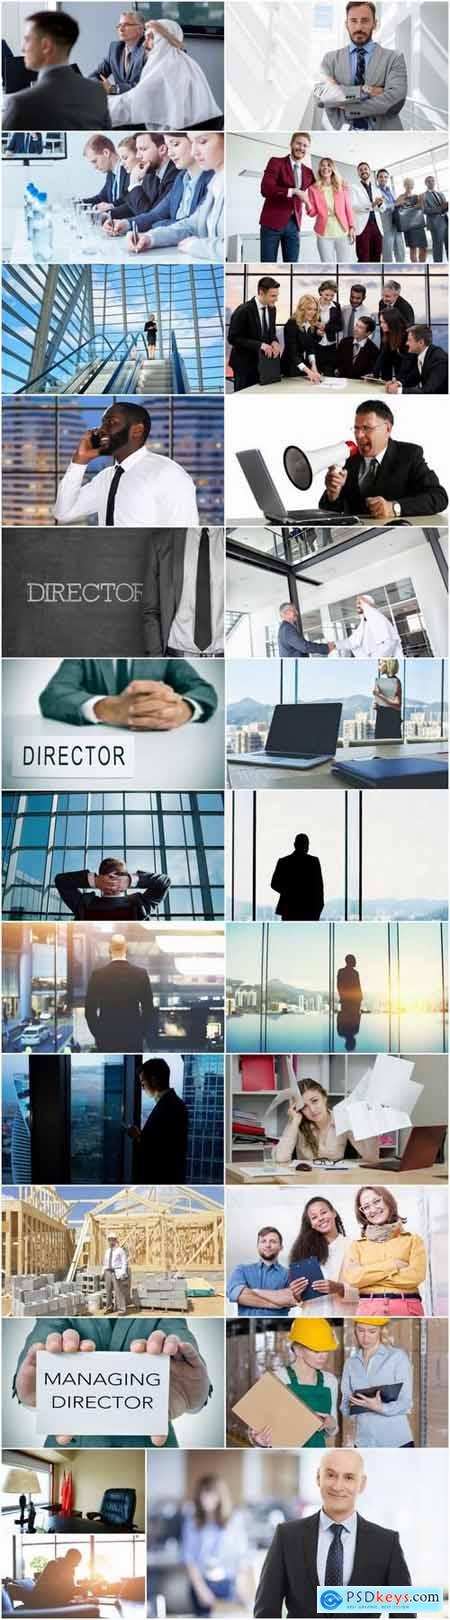 Director of the chief of financier boss 25 HQ Jpeg